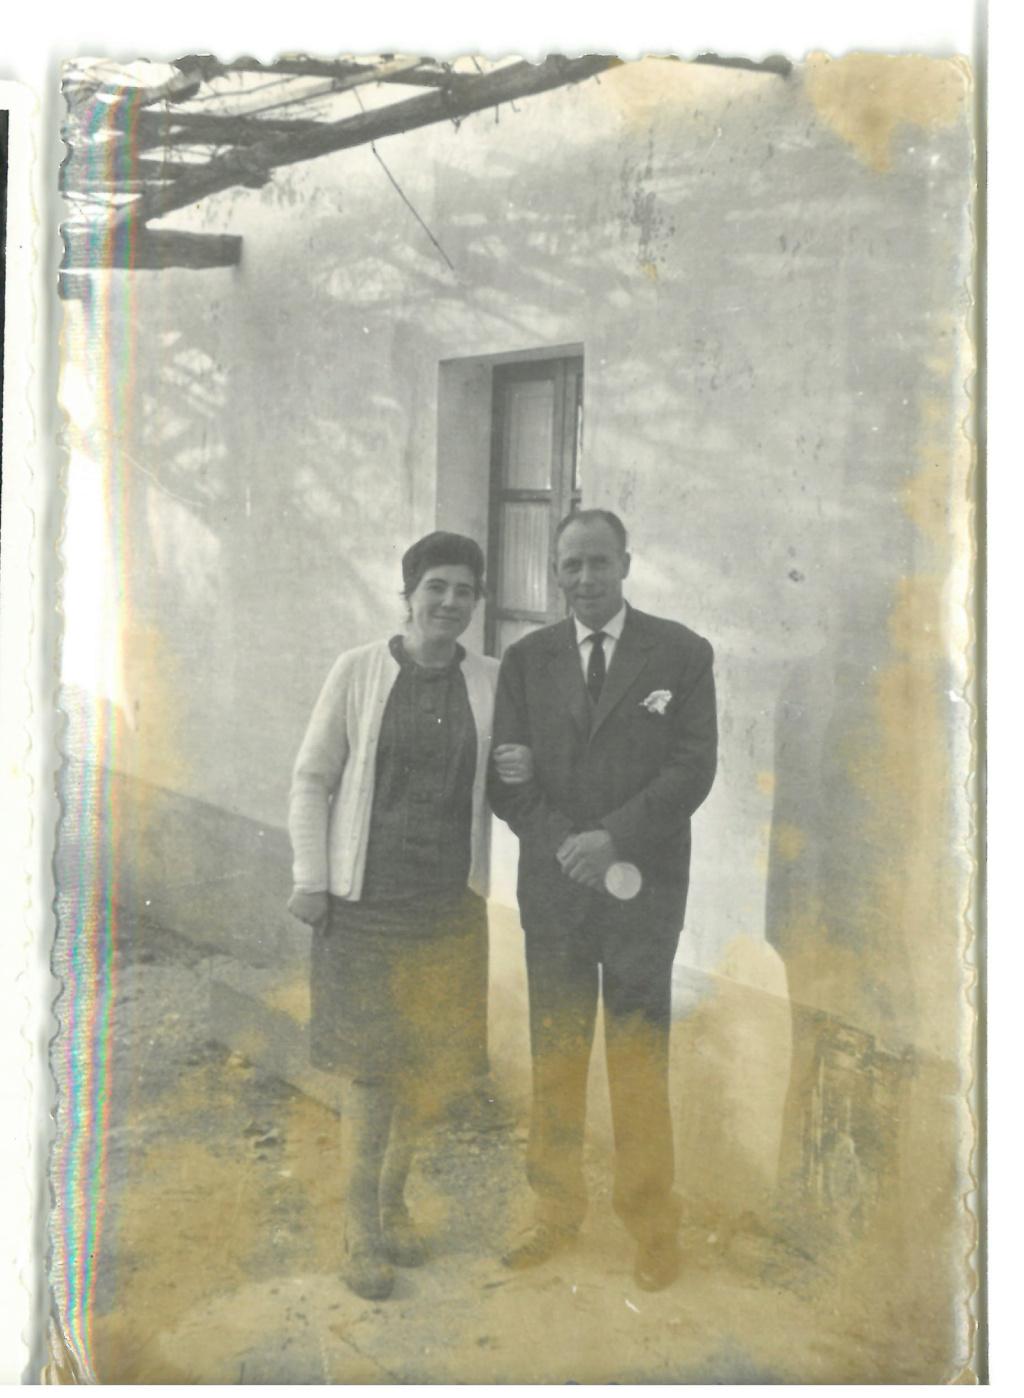 Fotos antiguas - Página 2 Skm_c416